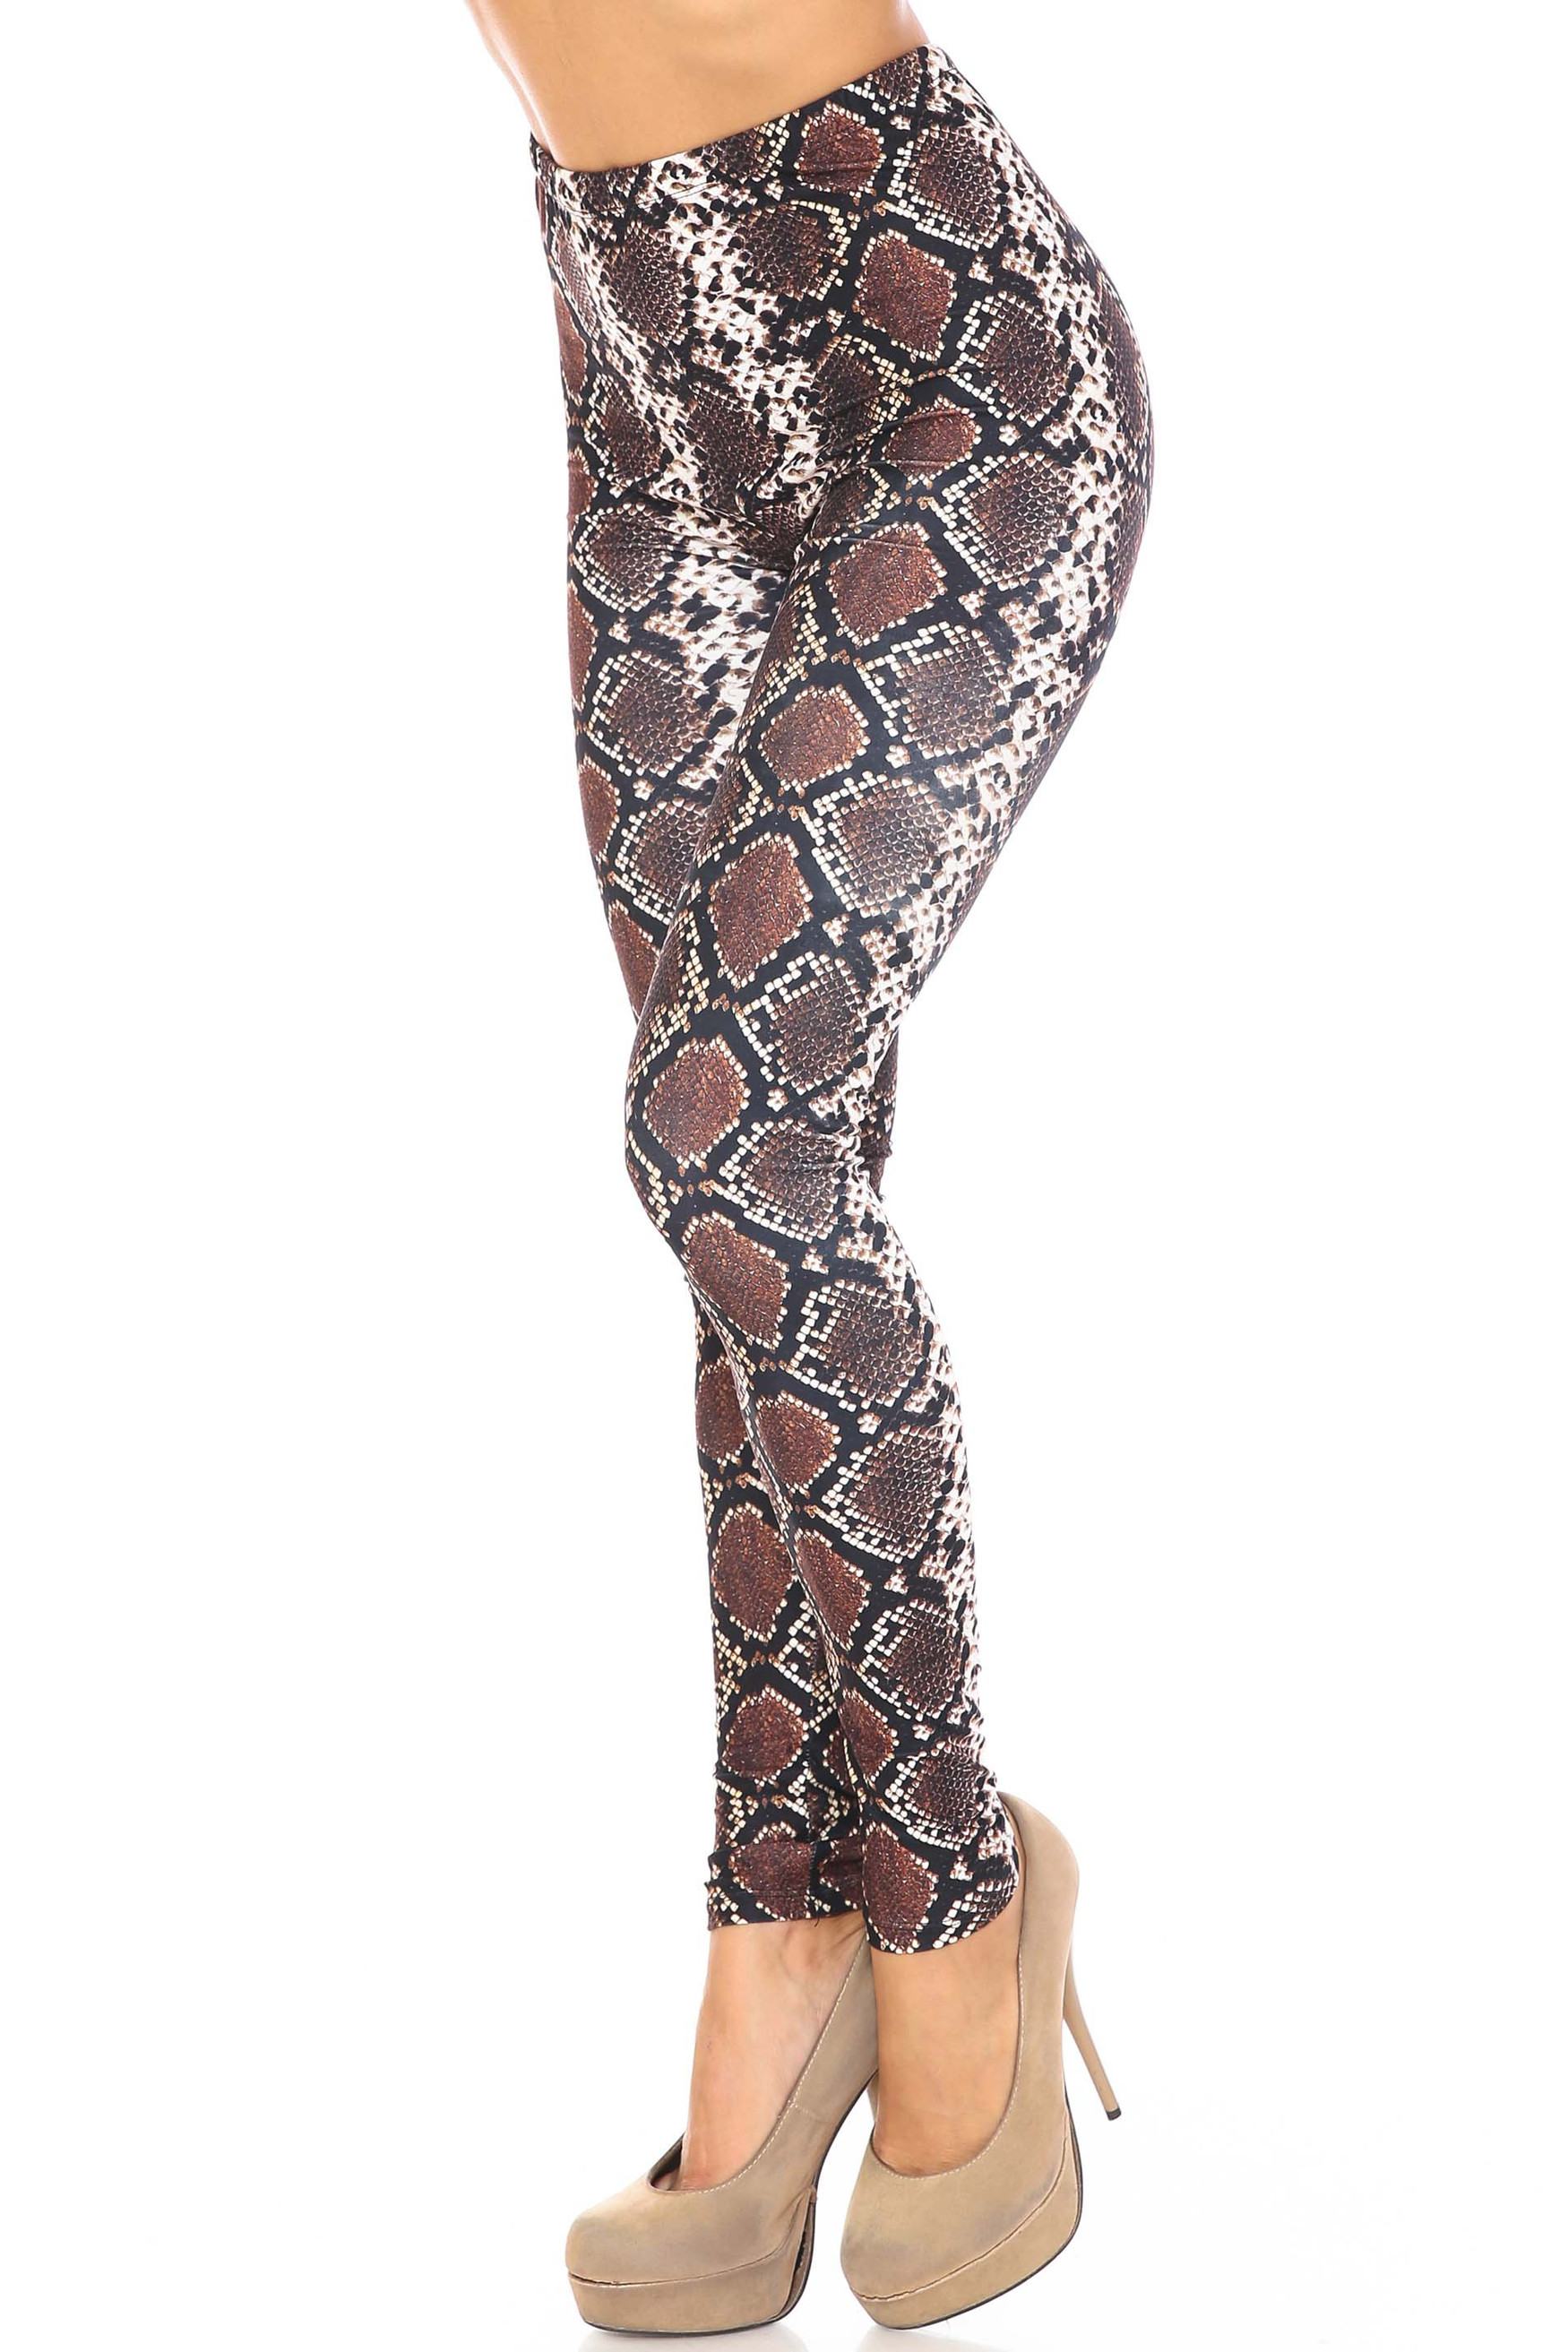 Left side of Creamy Soft  Brown Boa Snake Plus Size Leggings - USA Fashion™